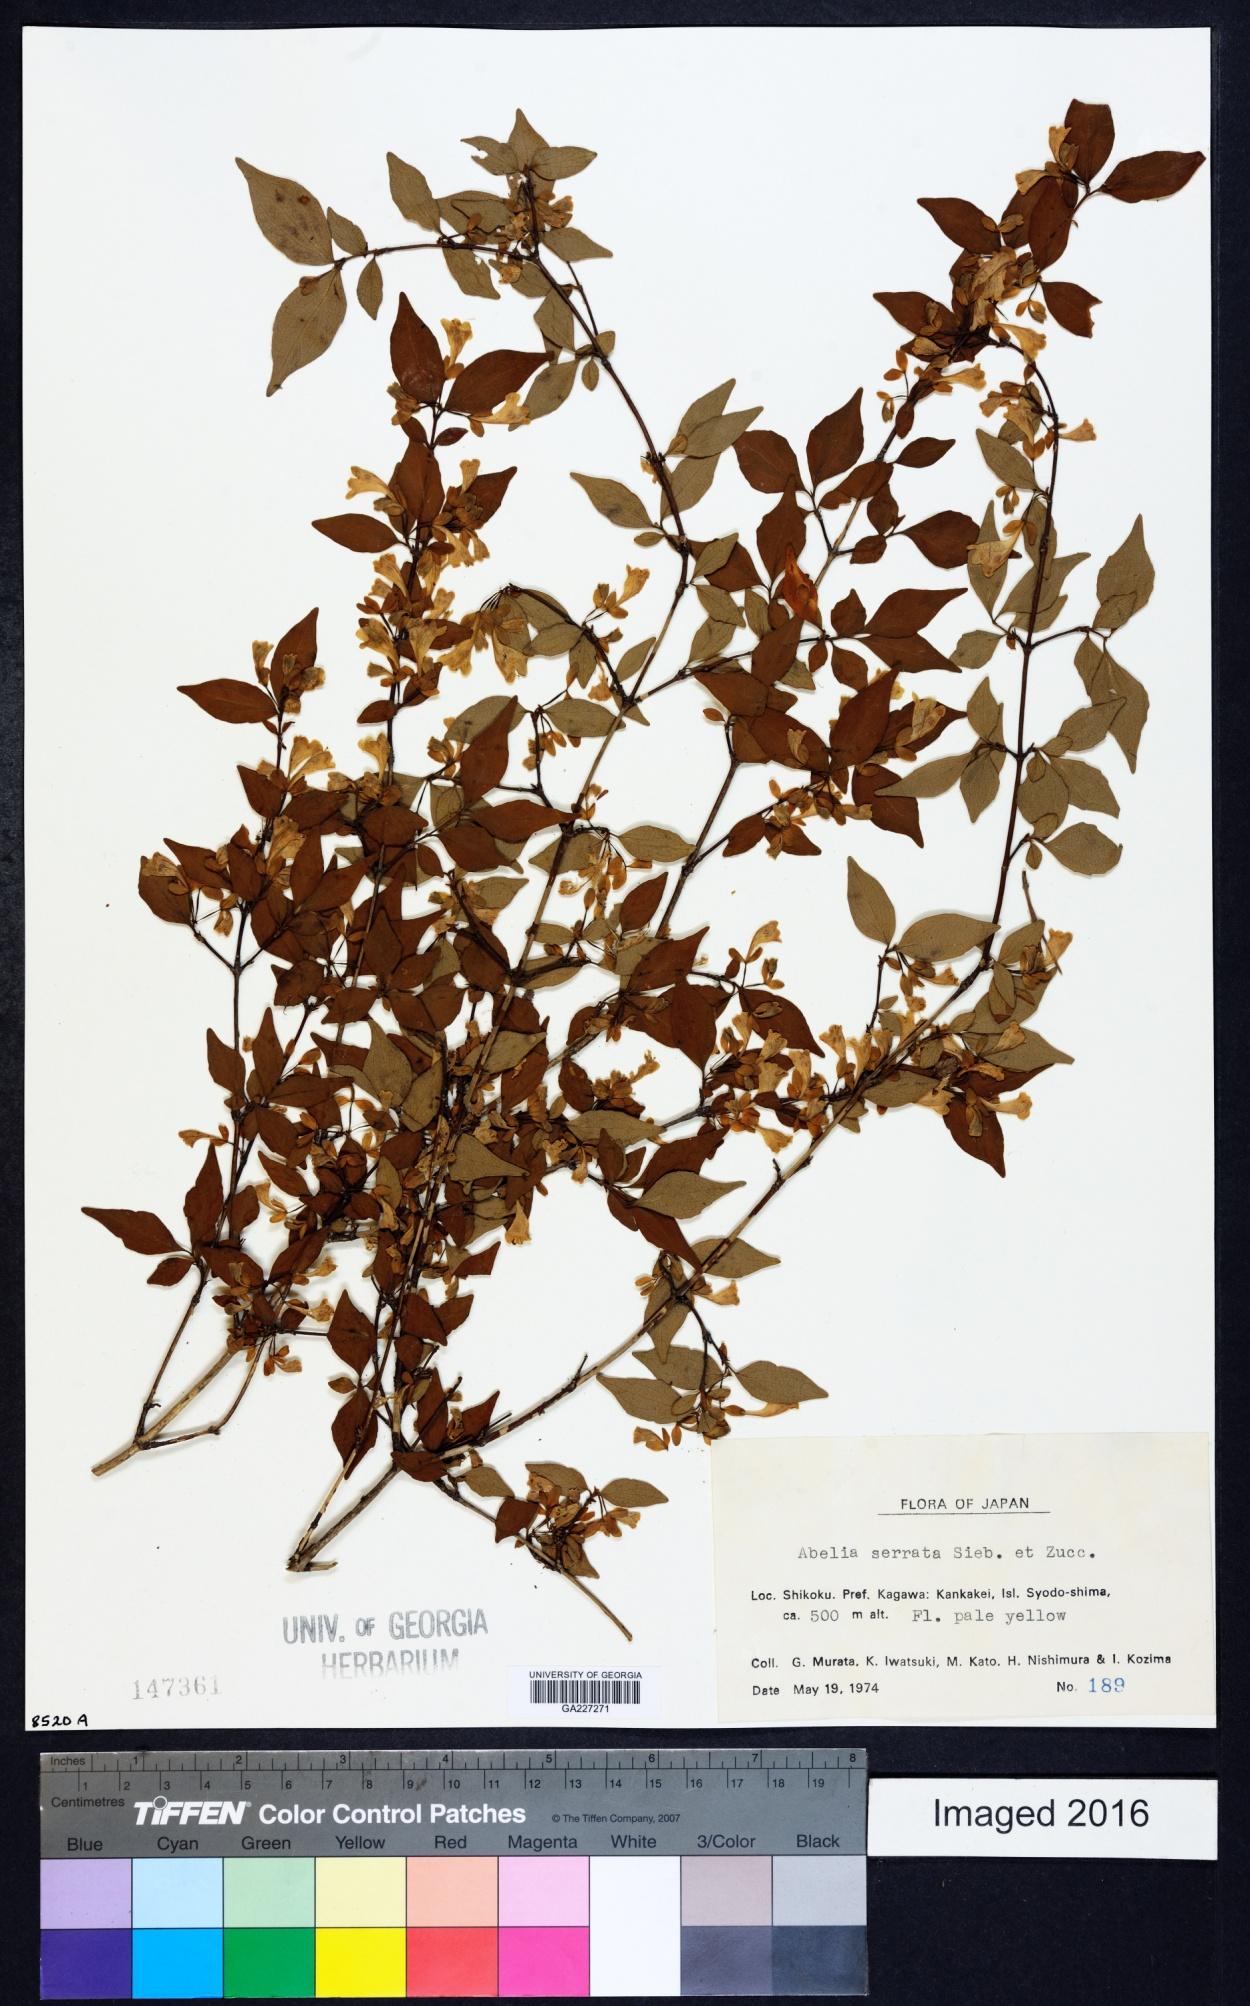 Diabelia image